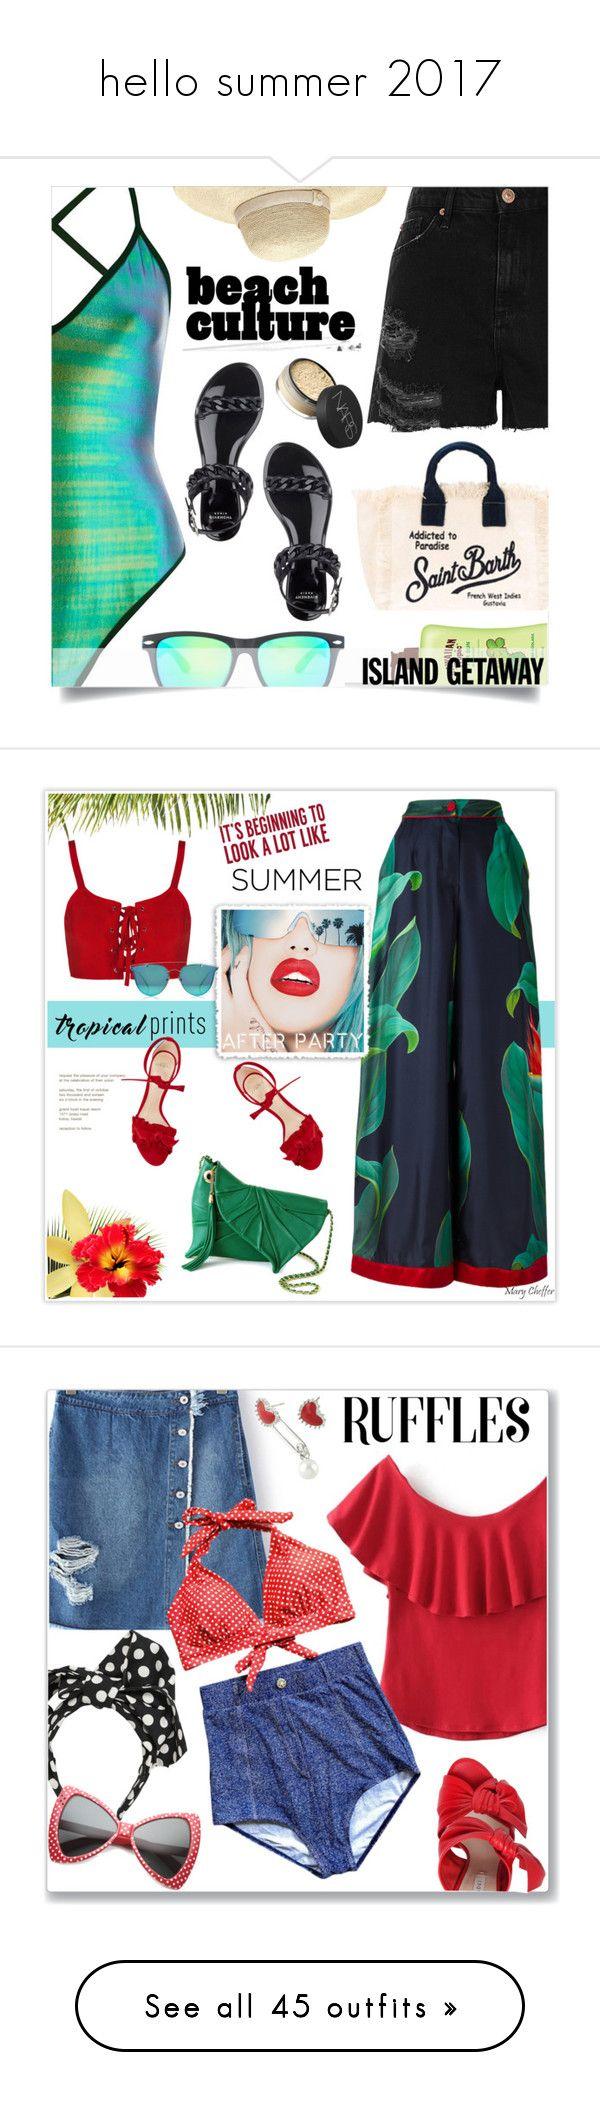 """hello summer 2017"" by polinachaban ❤ liked on Polyvore featuring River Island, Givenchy, Heidi Klein, MC2, Hawaiian Tropic, NARS Cosmetics, islandgetaway, F.R.S For Restless Sleepers, Rupaul and Sixtrees"